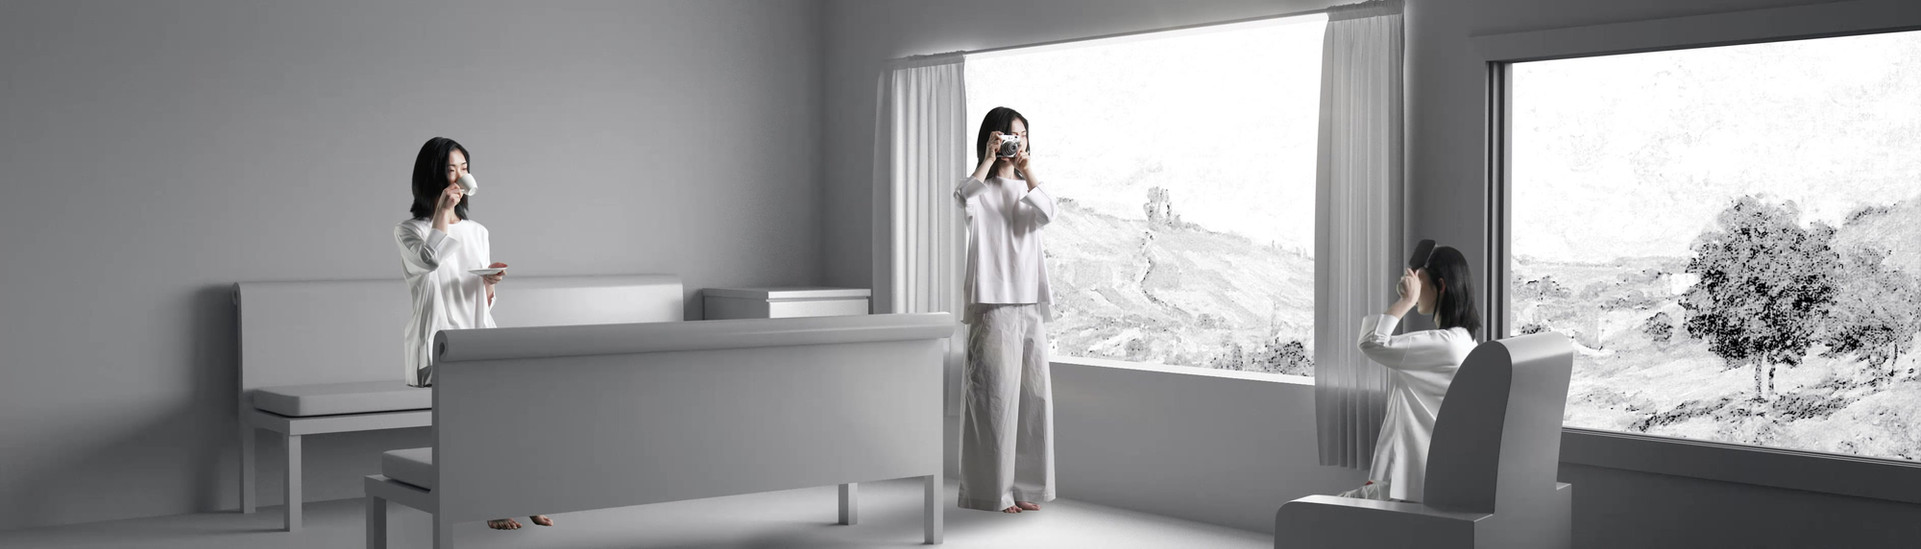 Shelter Konkuk Univ. Apparel Design Major. Graduation Fashion Show 2019  *Art Director : Seong Jae Jeon *Director of Photography : Hyeon Wook Park *Modeling : Yo Han Lim *Cast : Jin Young Kwon, Min Joon Lee